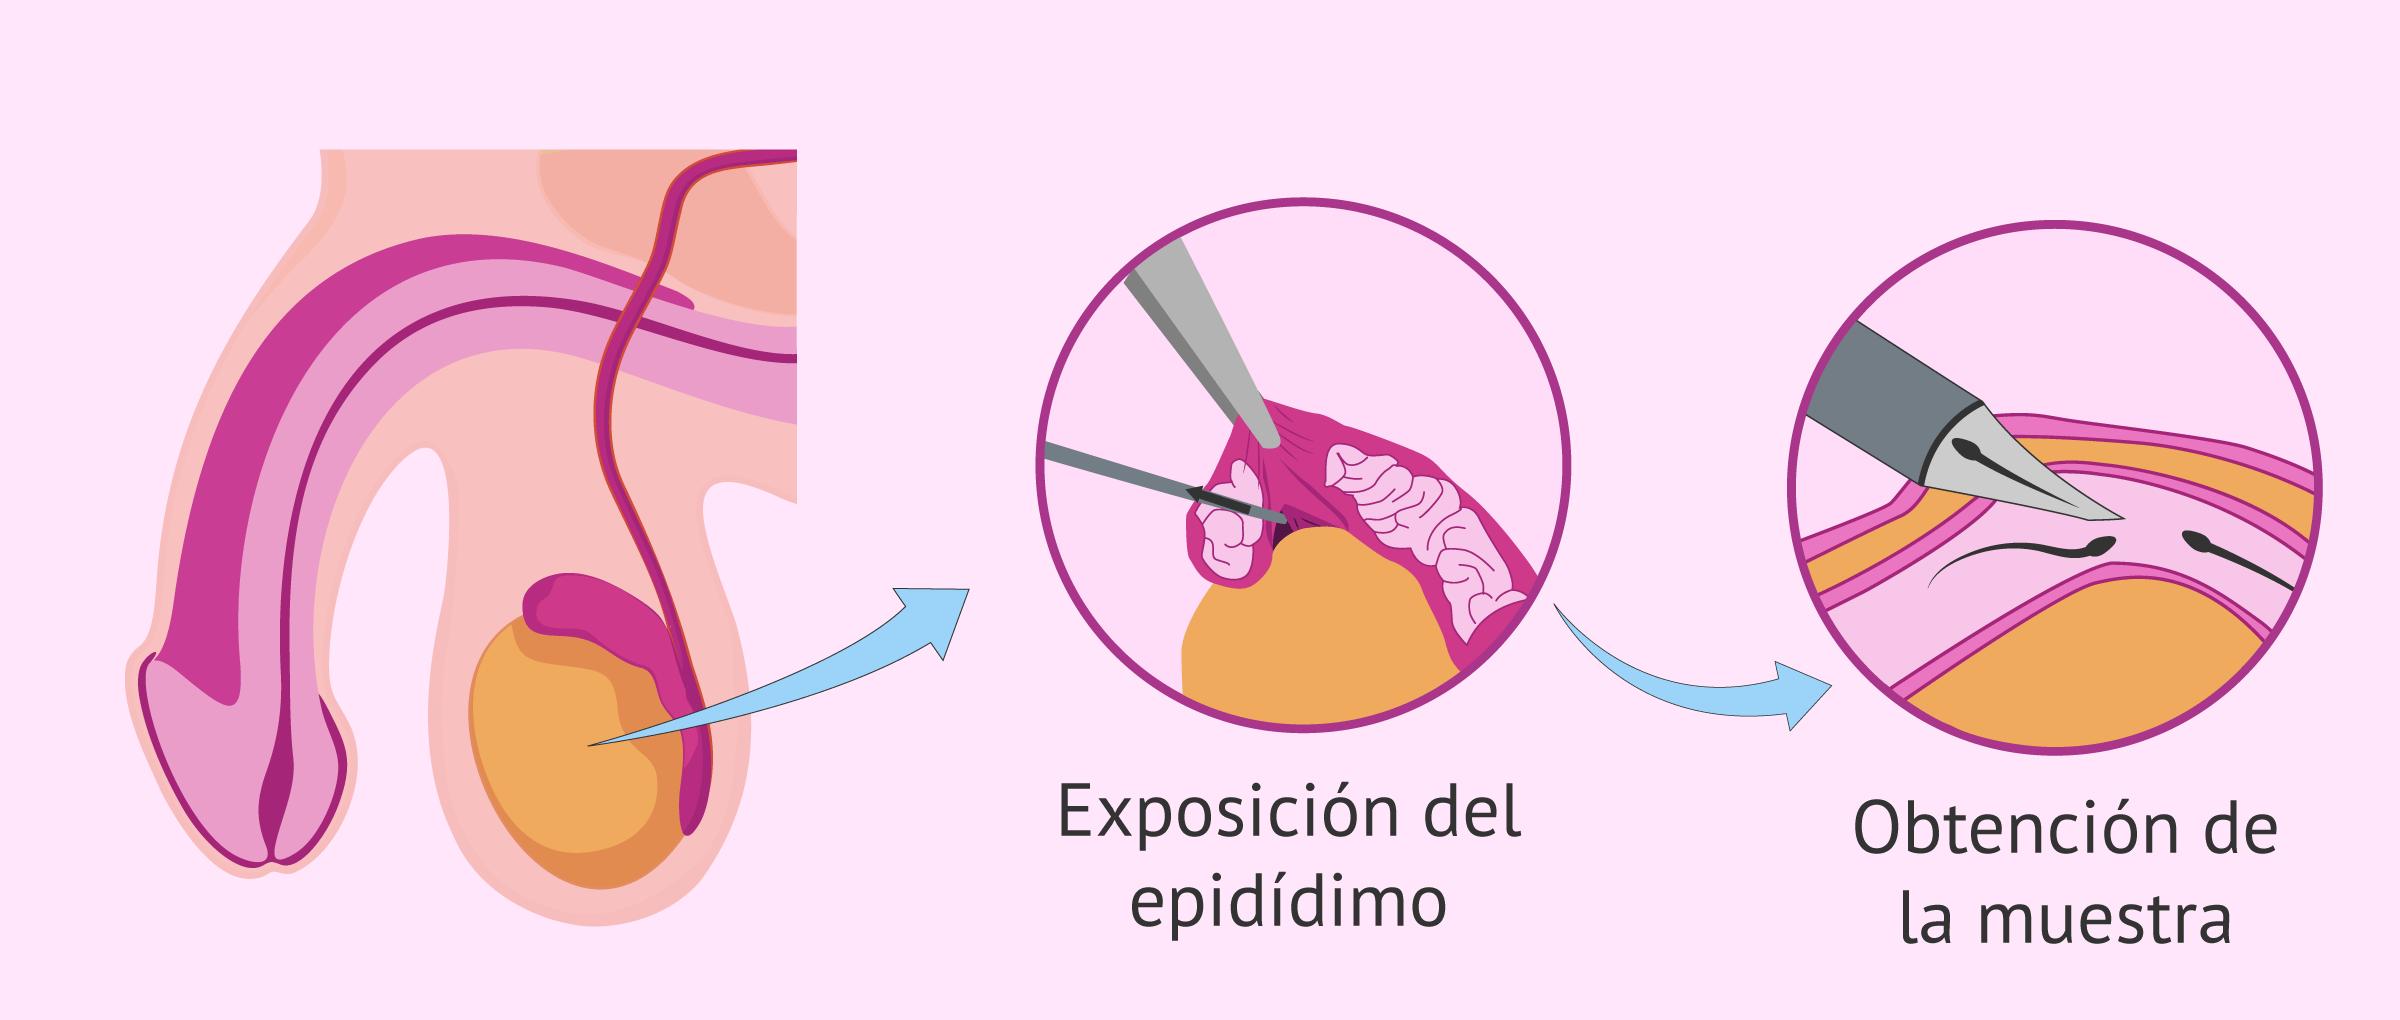 Aspiración de espermatozoides del epidídimo por MESA